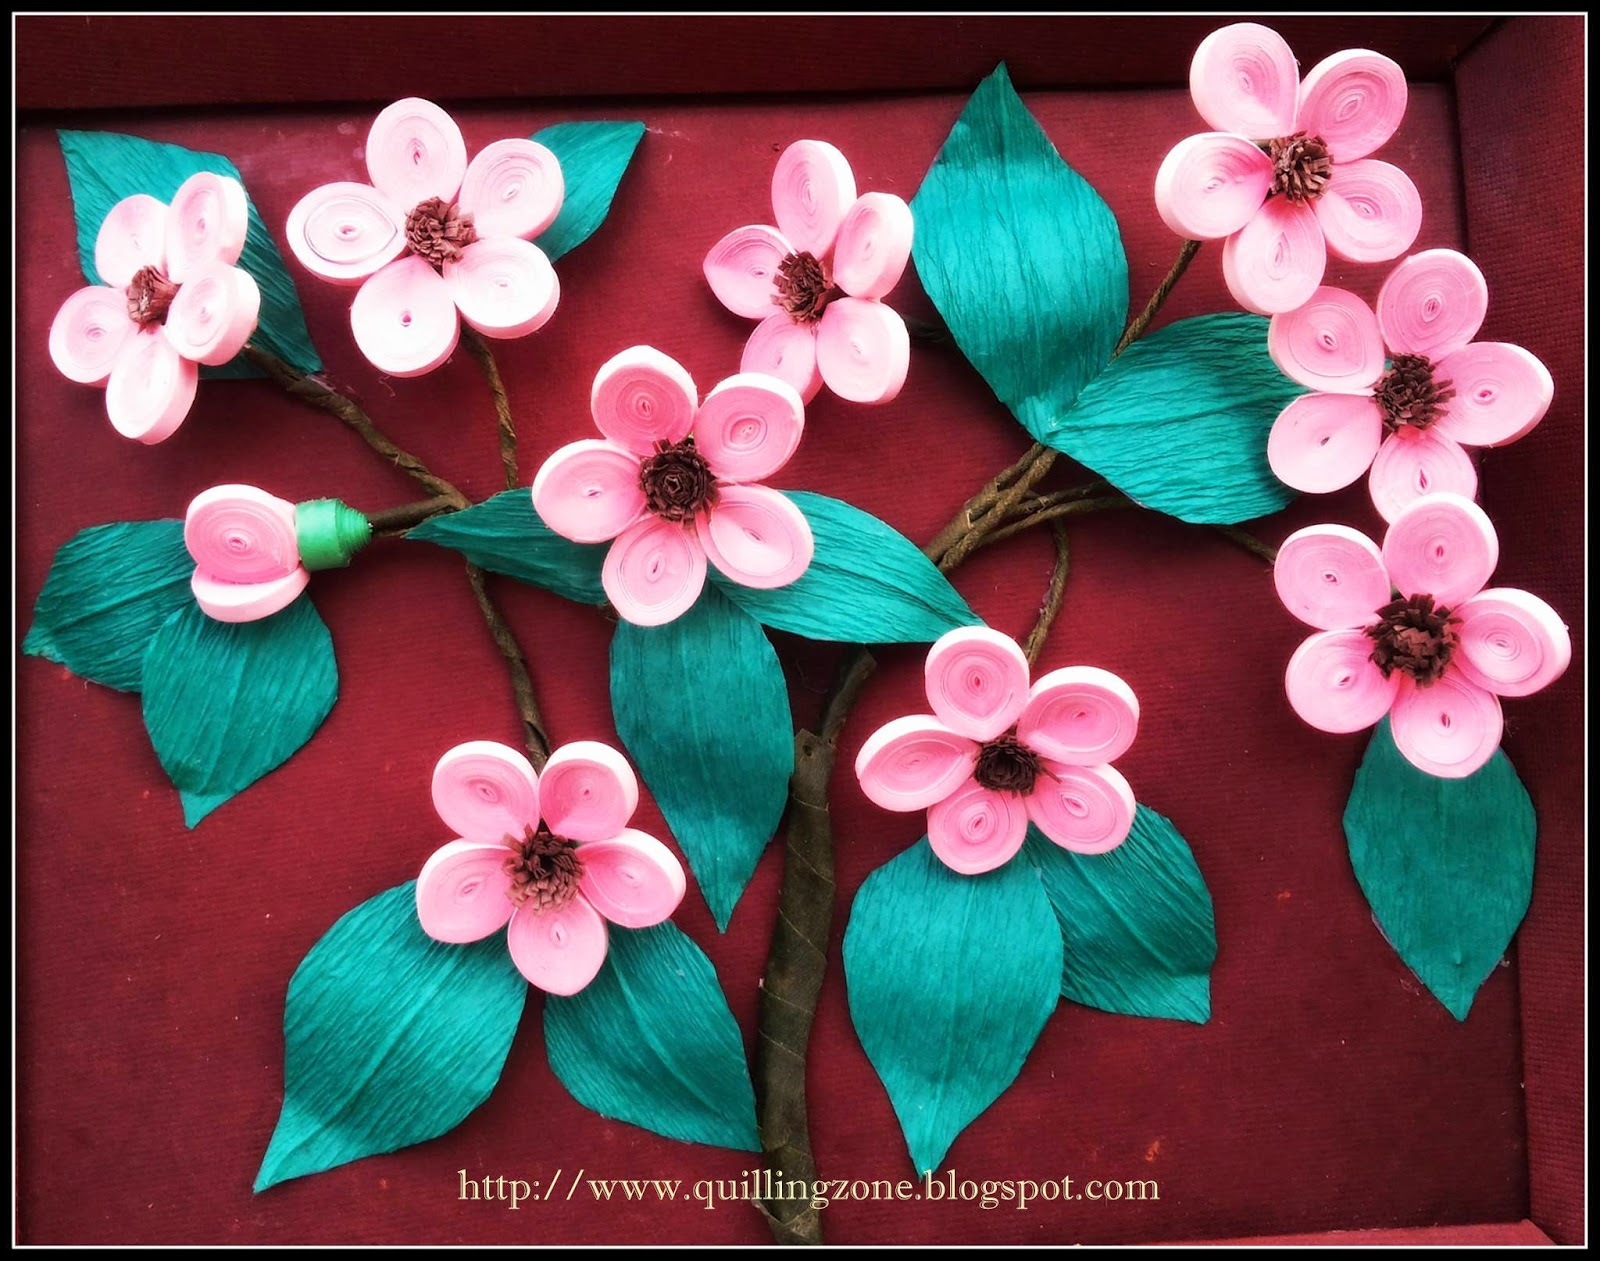 http://quillingzone.blogspot.tw/2014/06/quilling-flower-arrangement.html